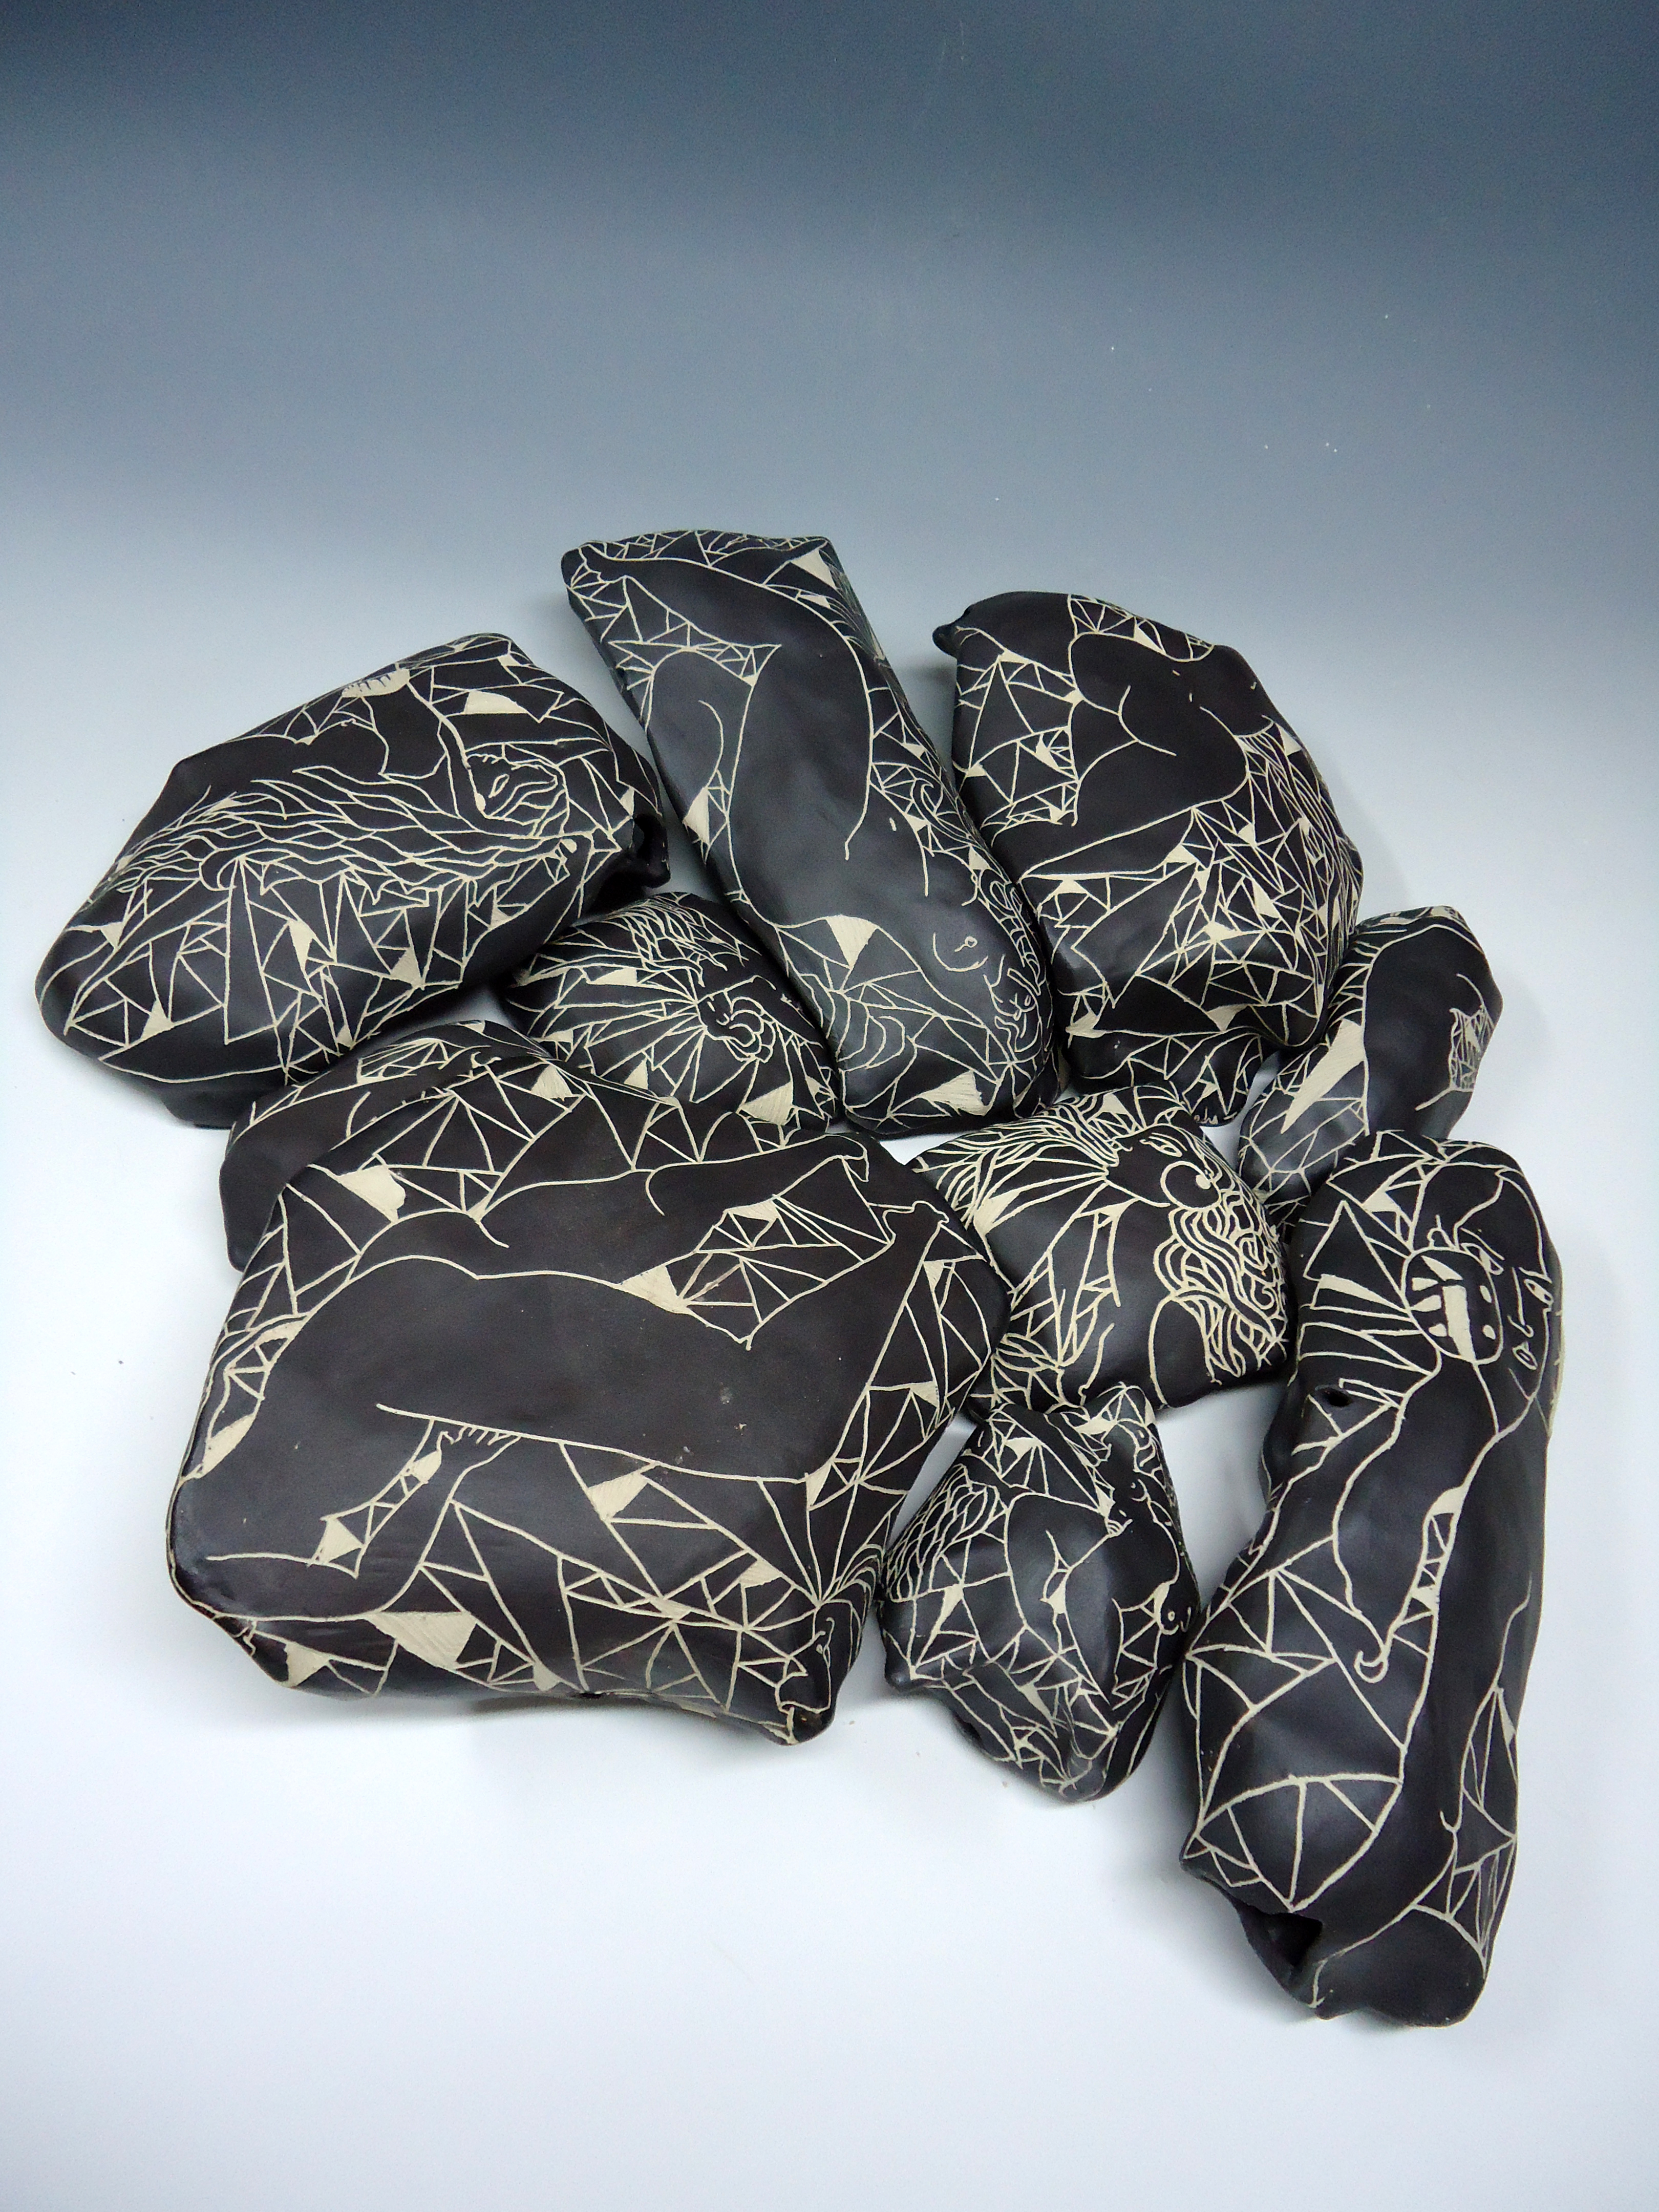 alexandratollet-eboulis de pierres1-3-automne13.jpg